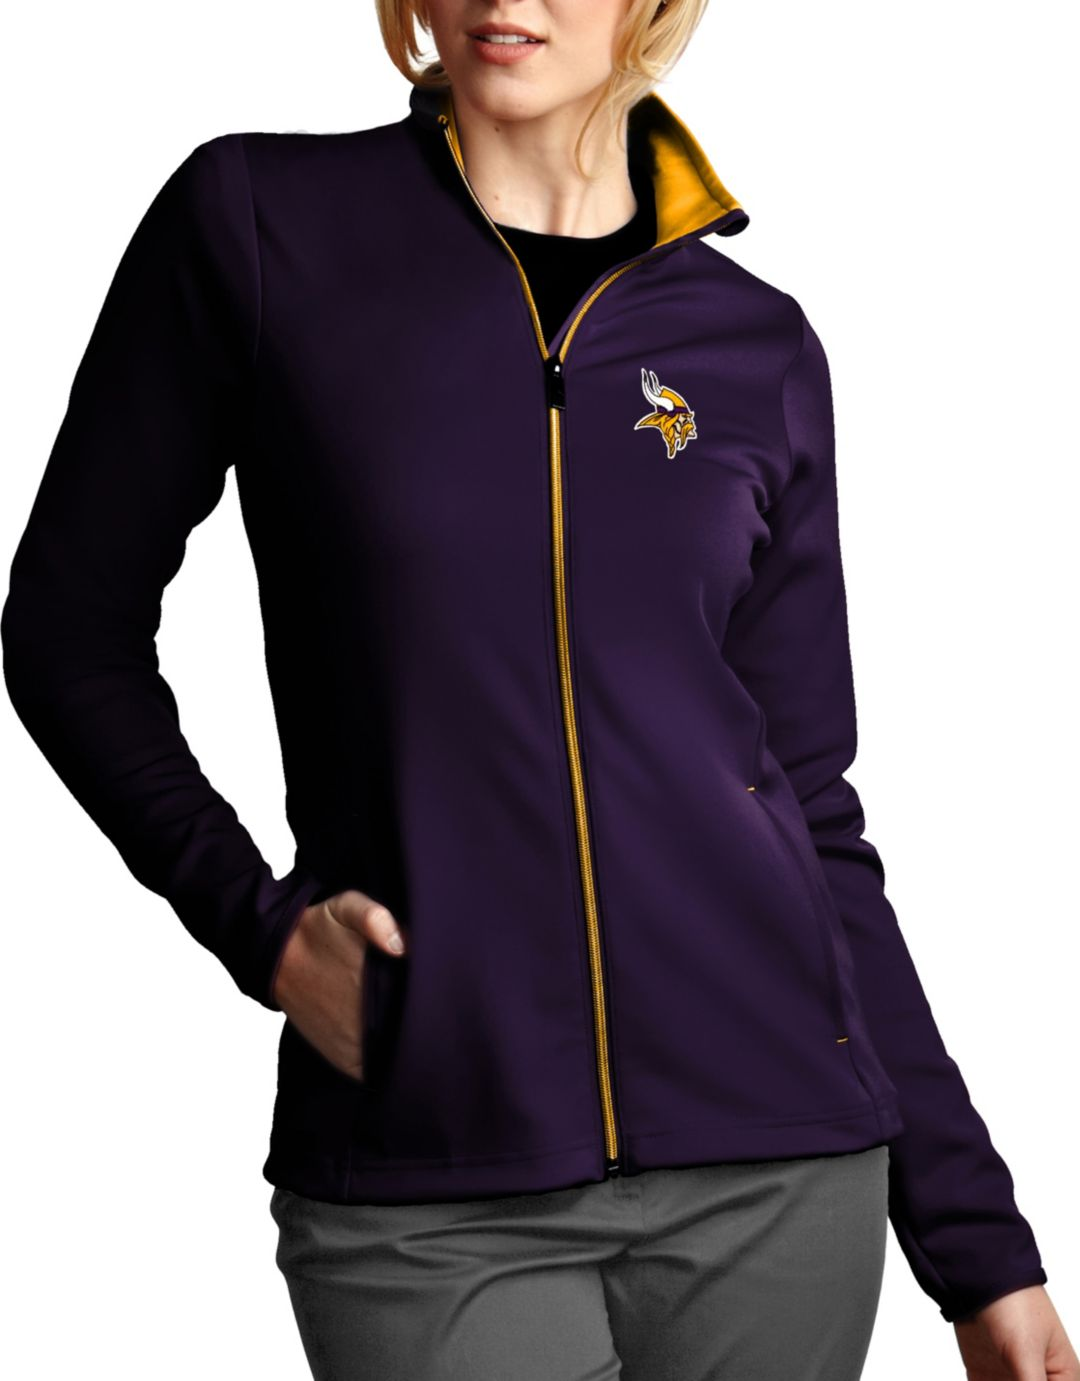 info for eadd1 5ccae Antigua Women's Minnesota Vikings Leader Full-Zip Purple Jacket